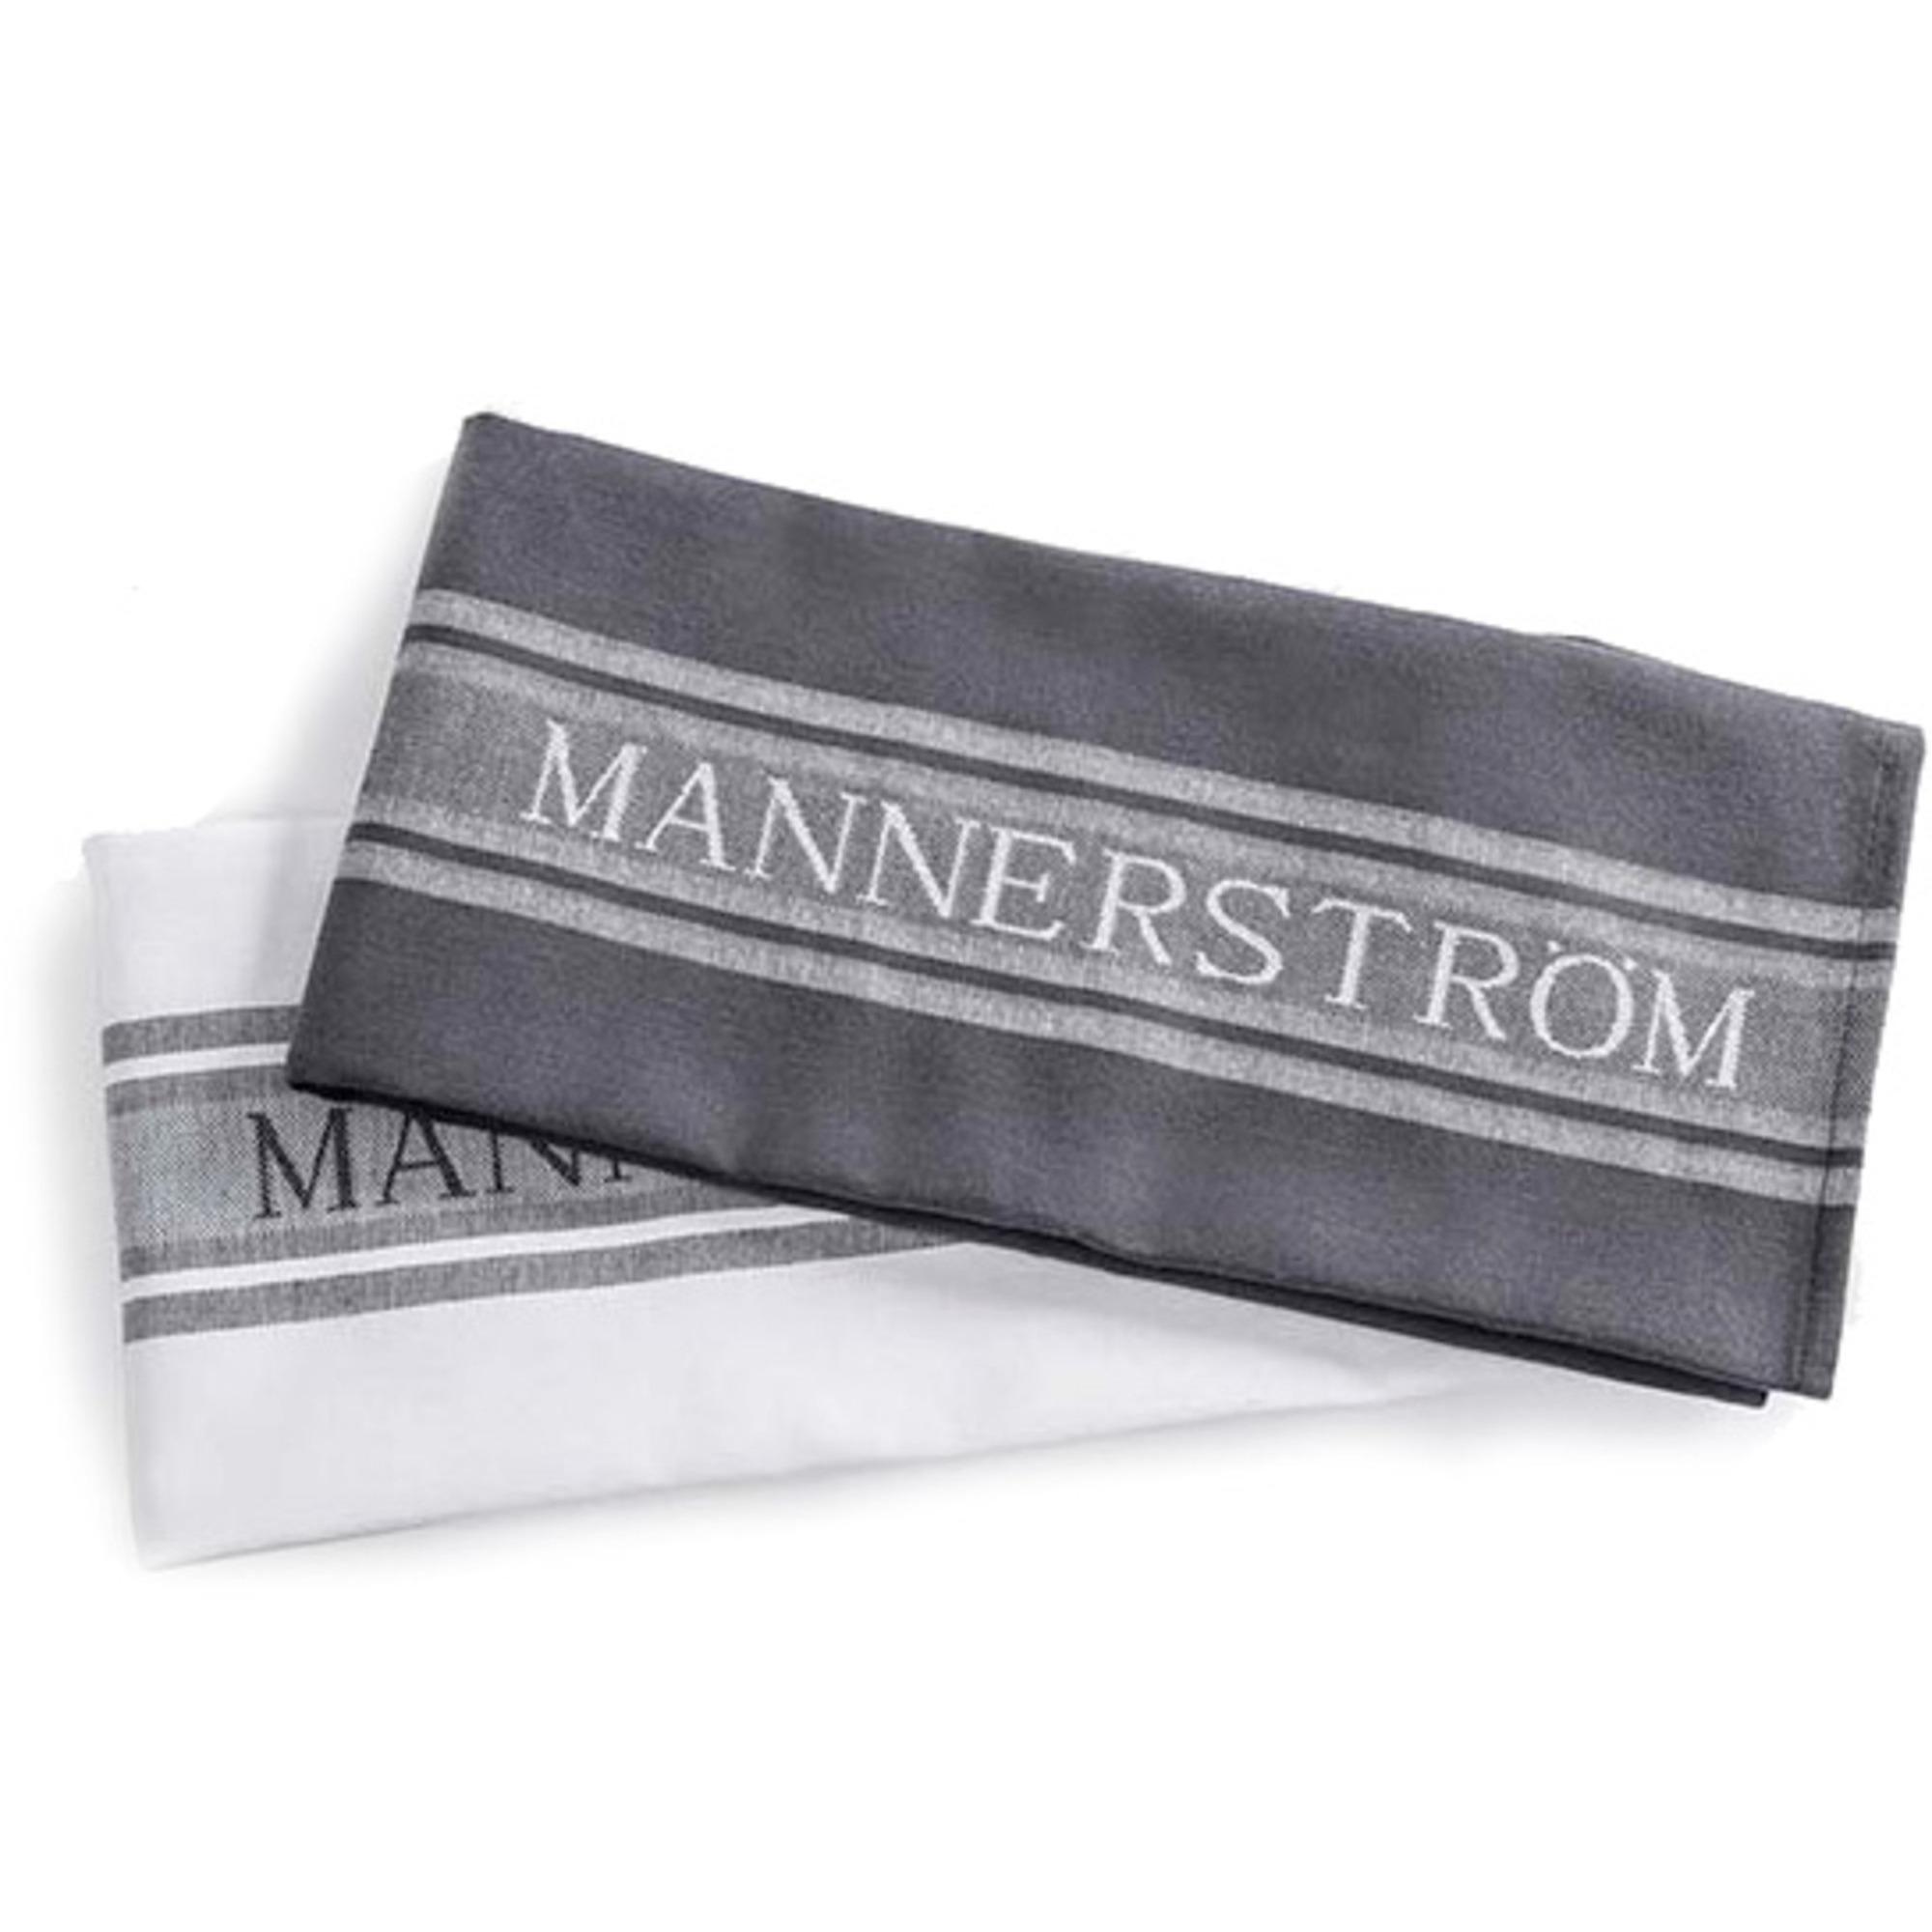 Mannerströms Kökshanddukar 2-pack